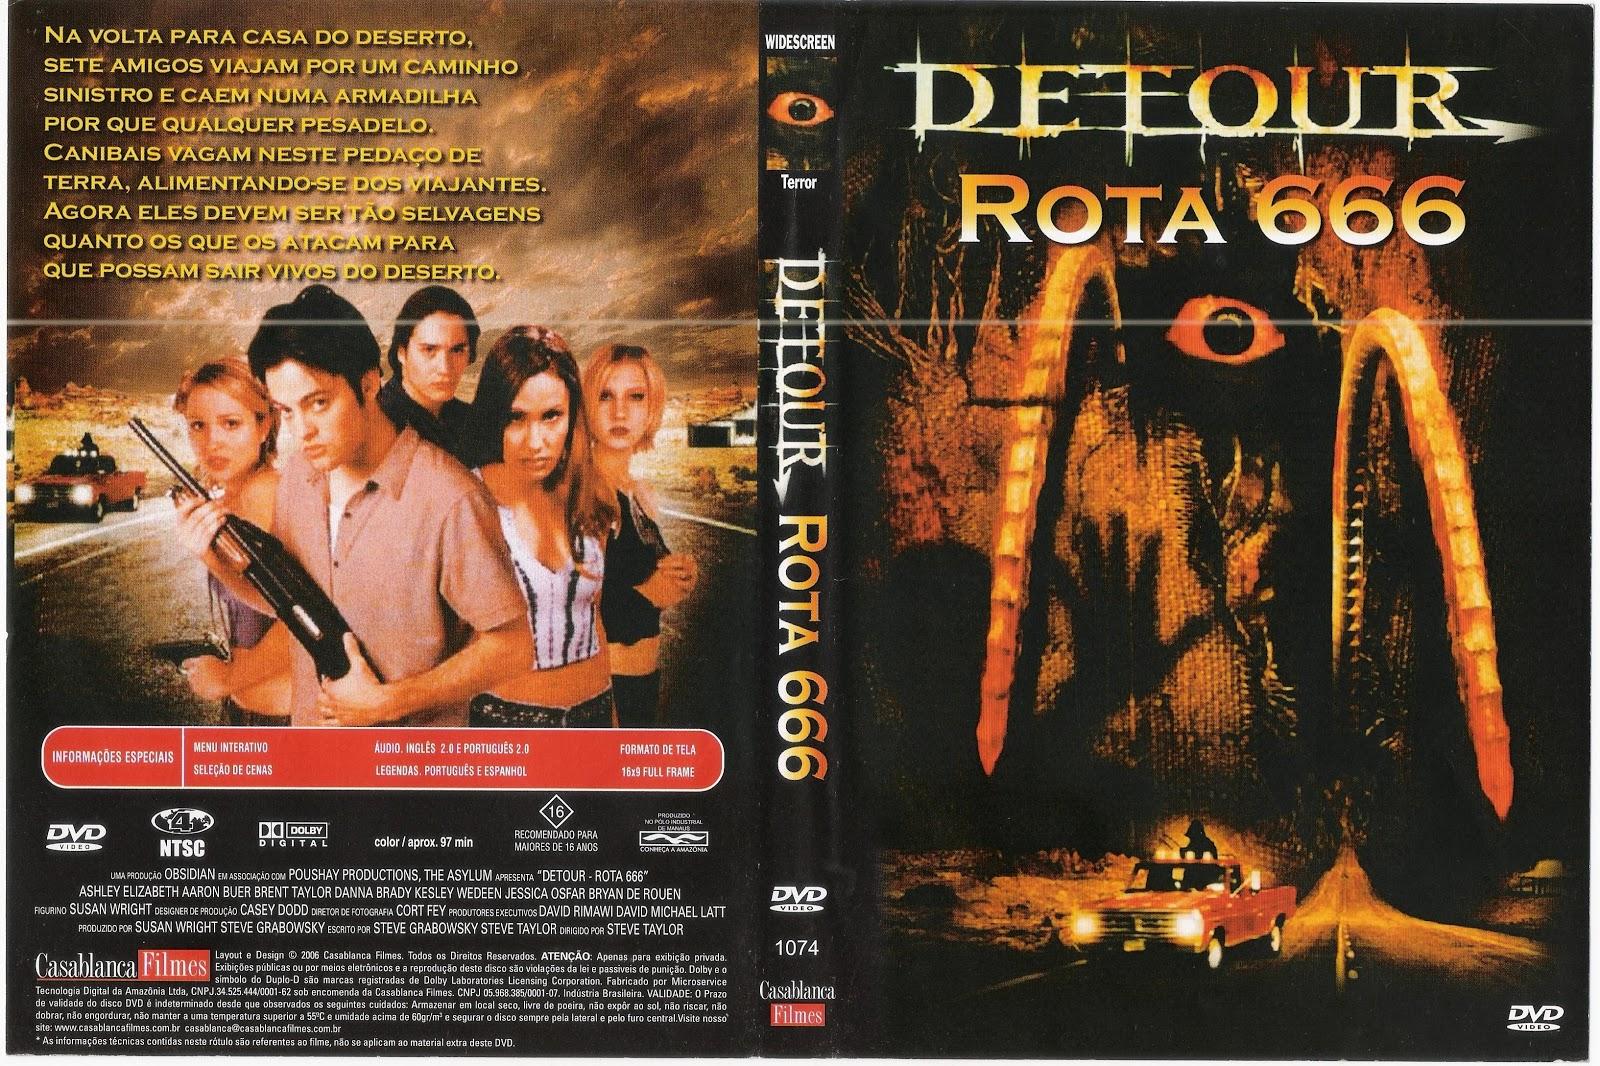 Capa DVD Detour Rota 666